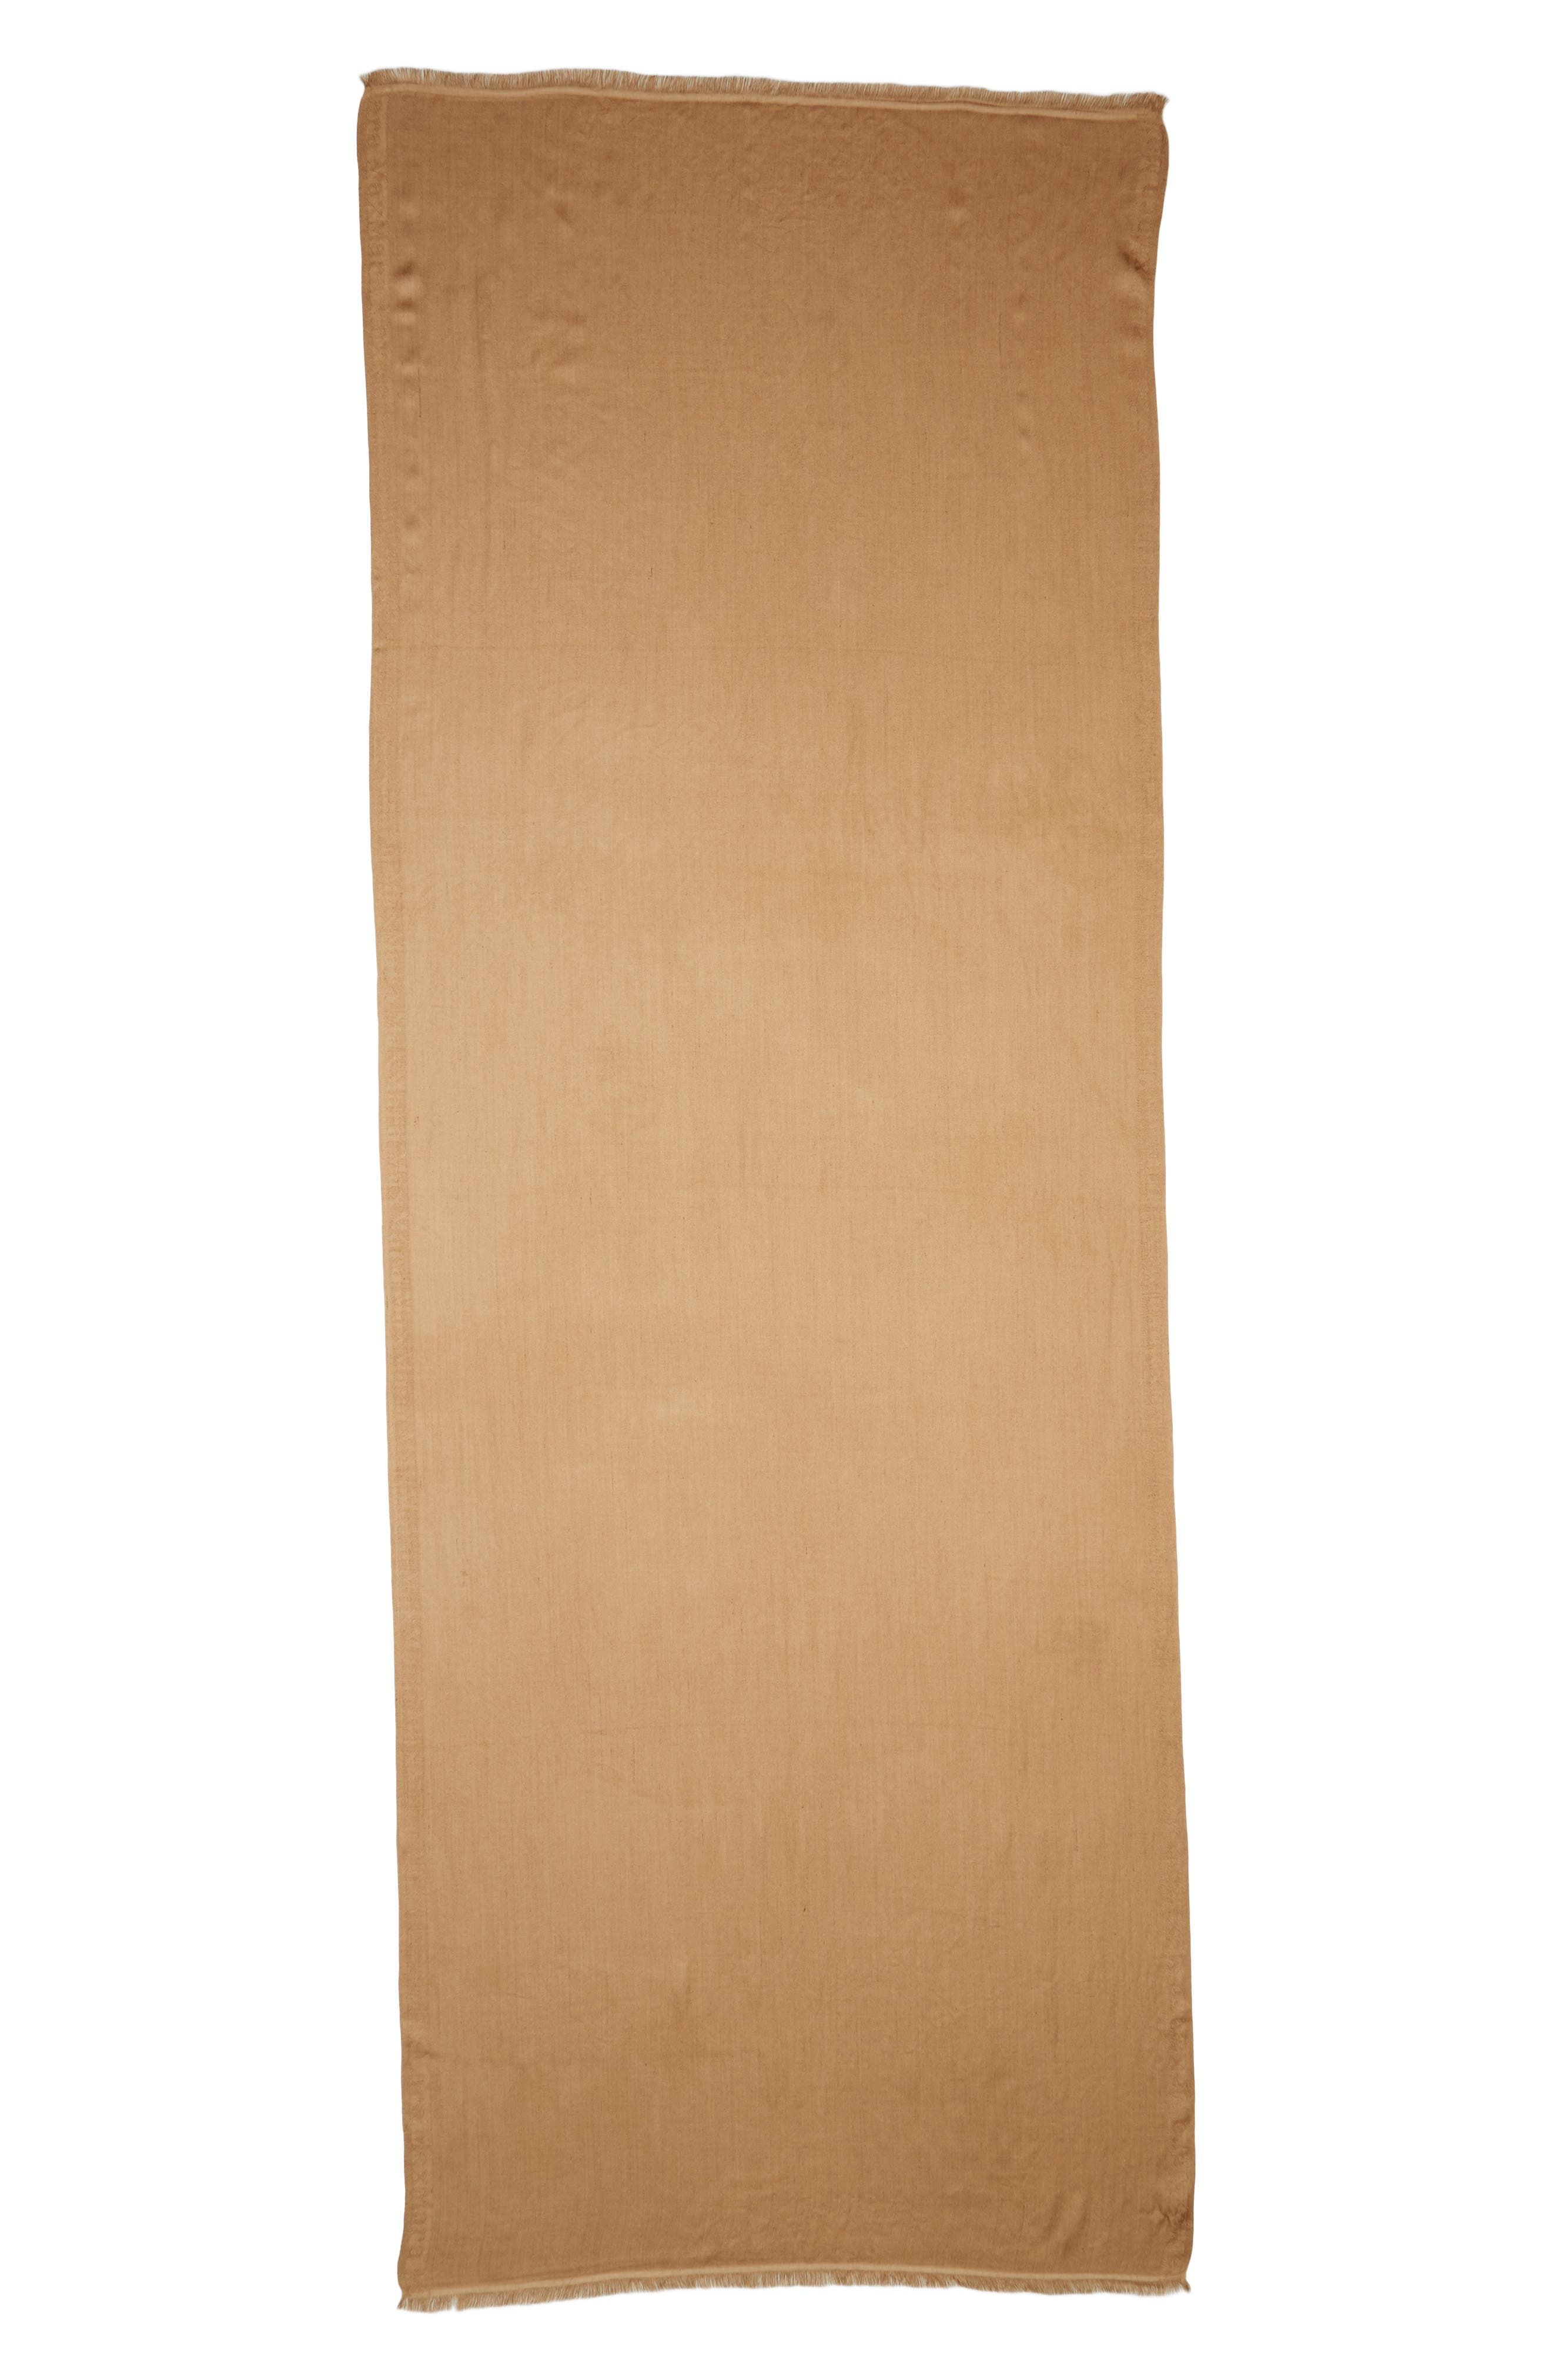 Upupa Silk Scarf,                         Main,                         color, Camel